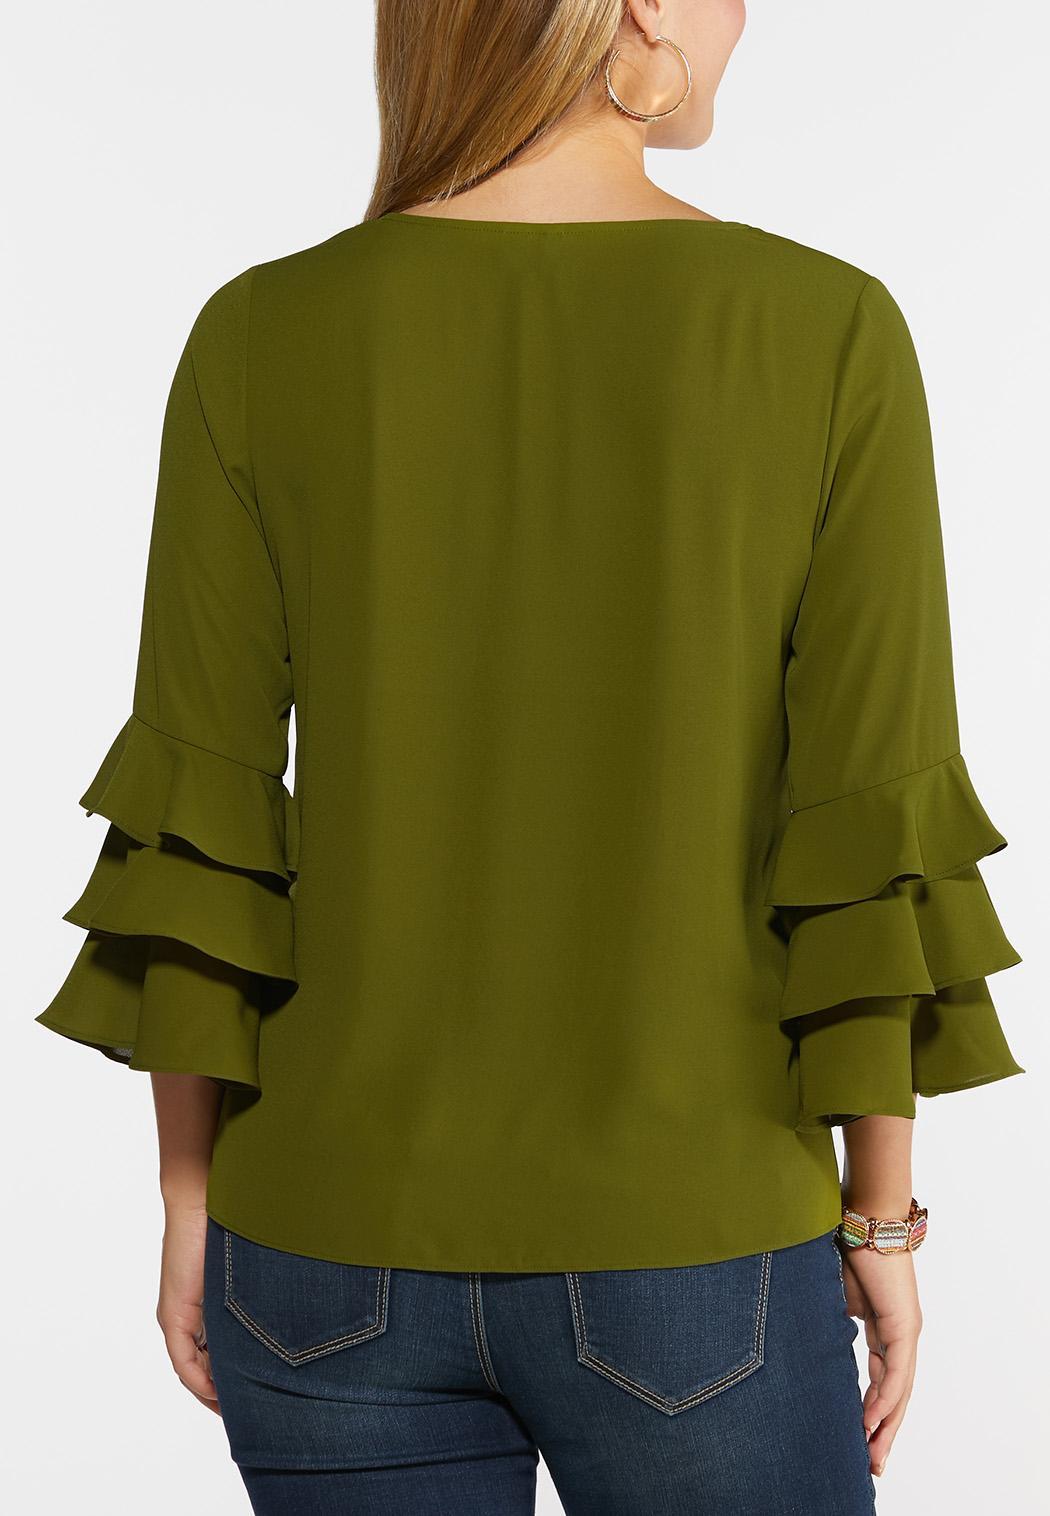 Plus Size Triple Ruffled Sleeve Top (Item #44335284)